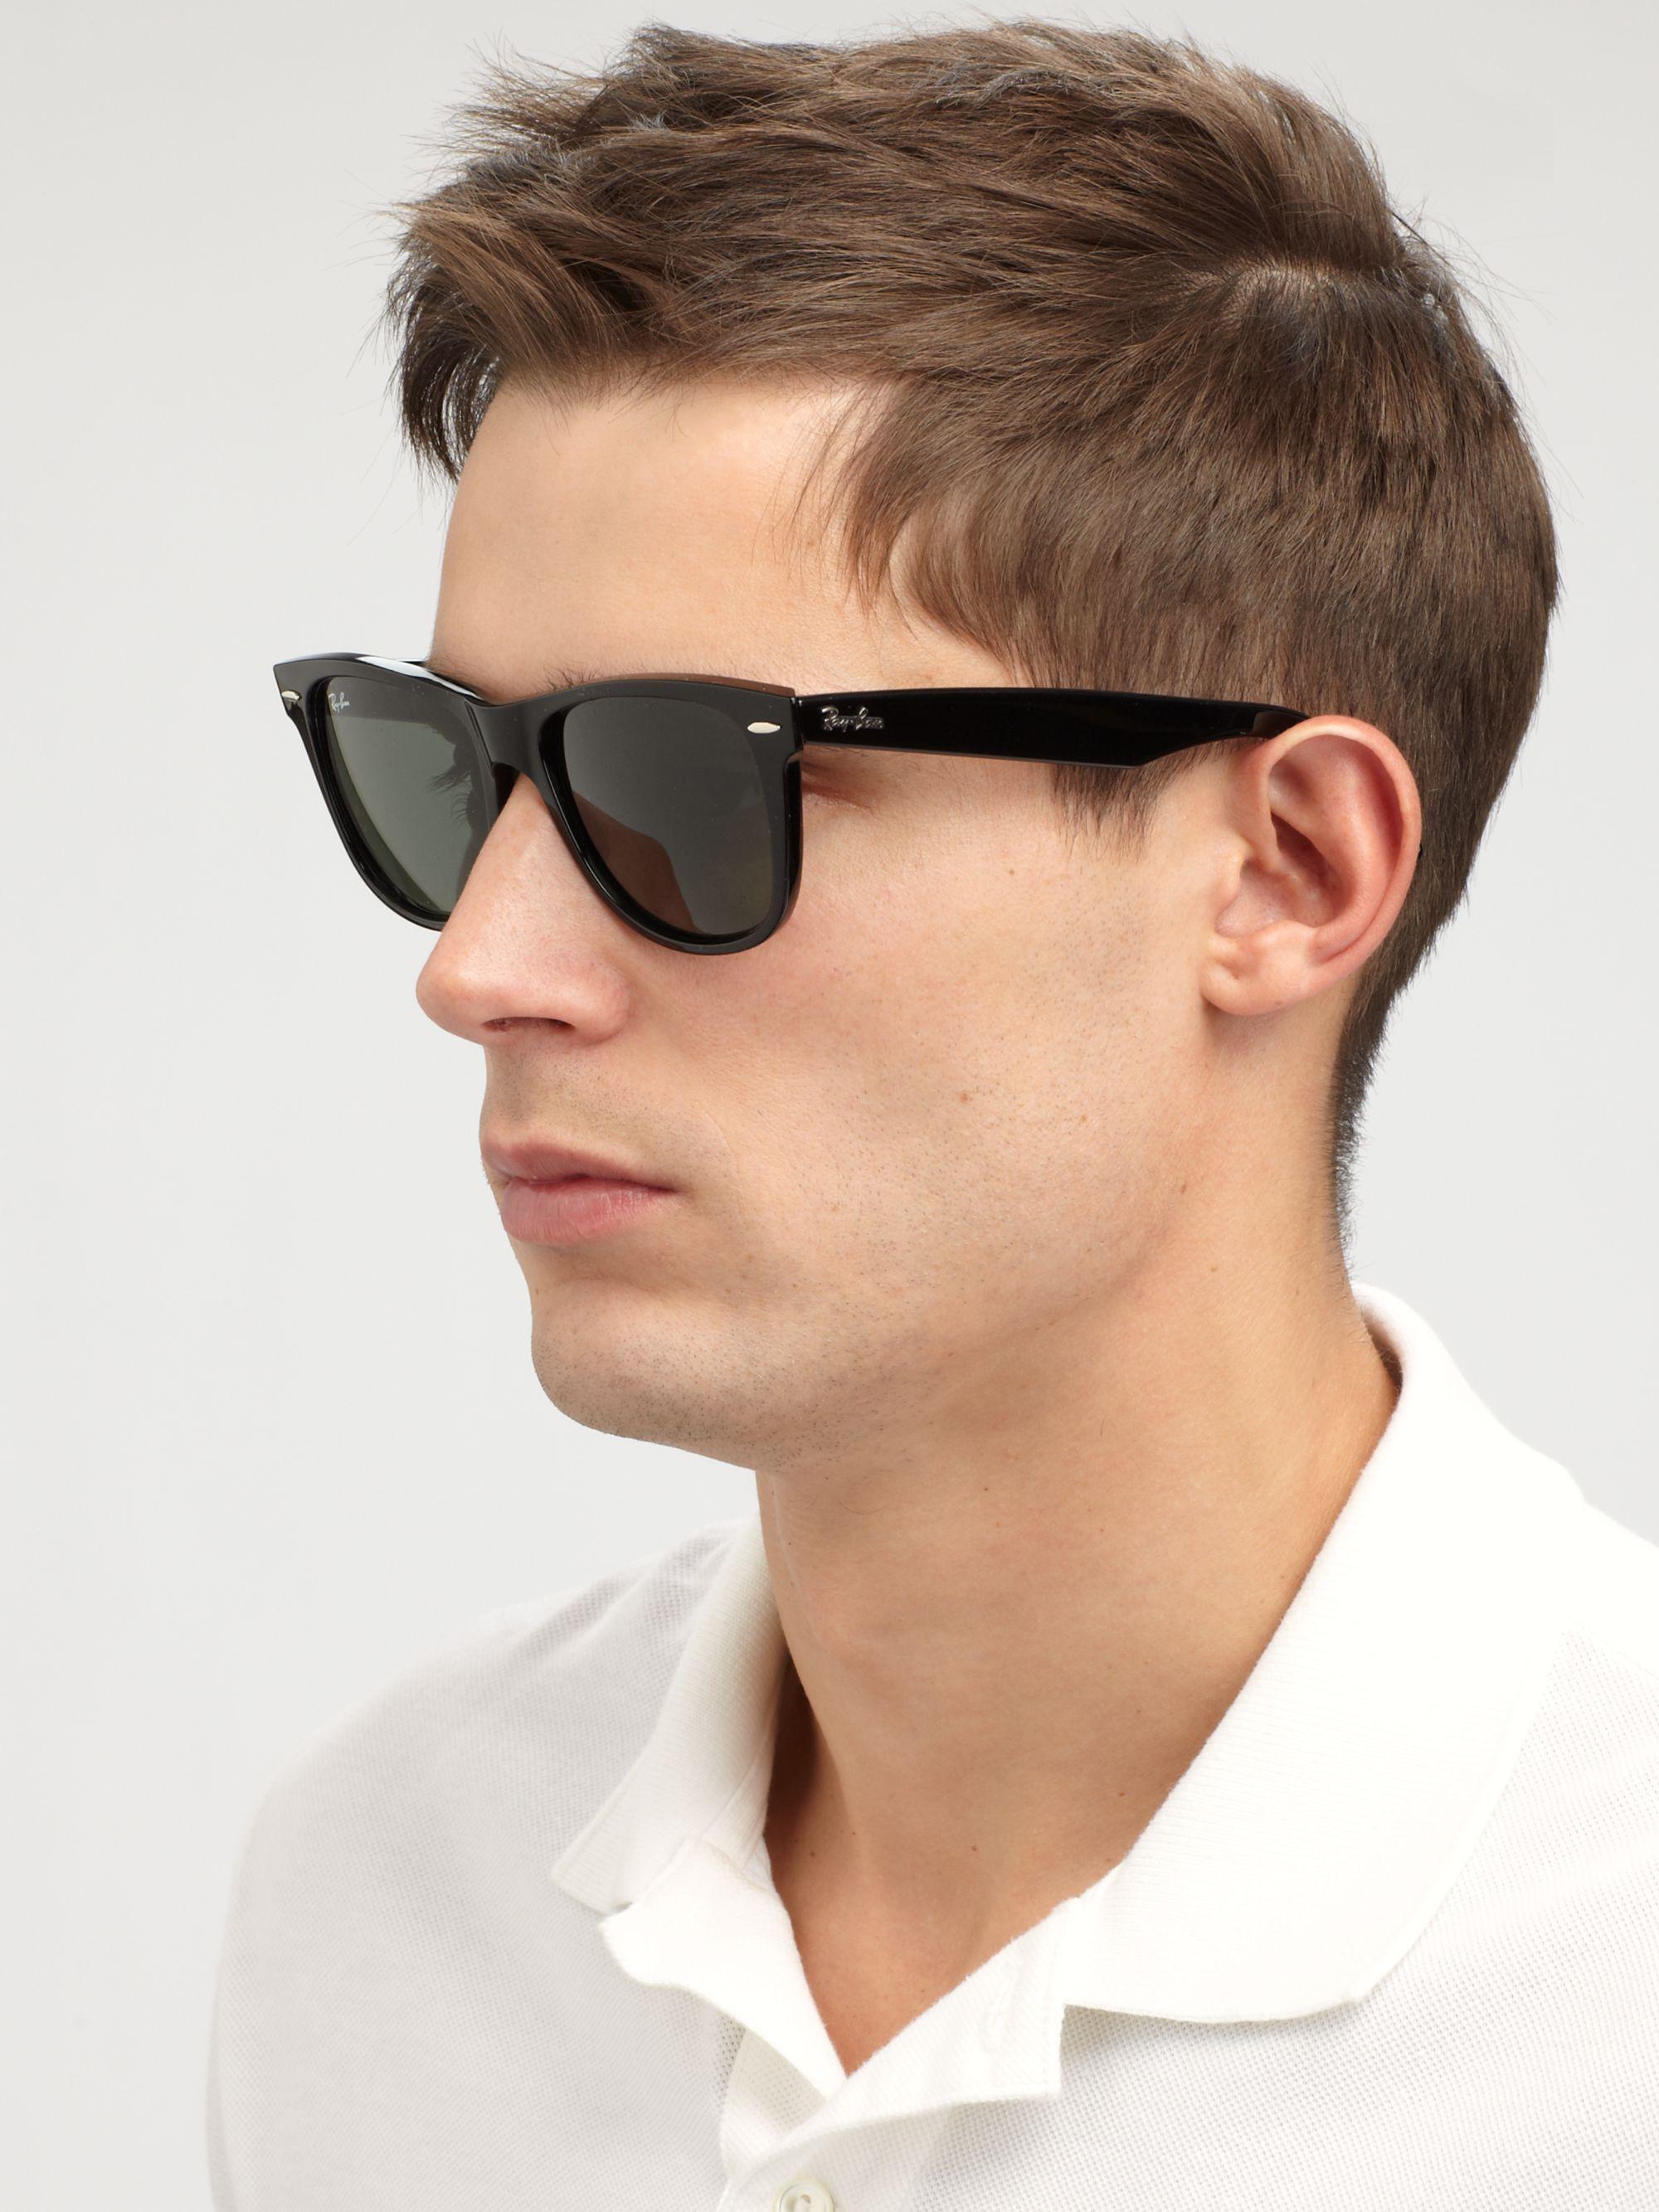 60085f257c Lyst - Ray-Ban Classic Wayfarer Sunglasses in Black for Men